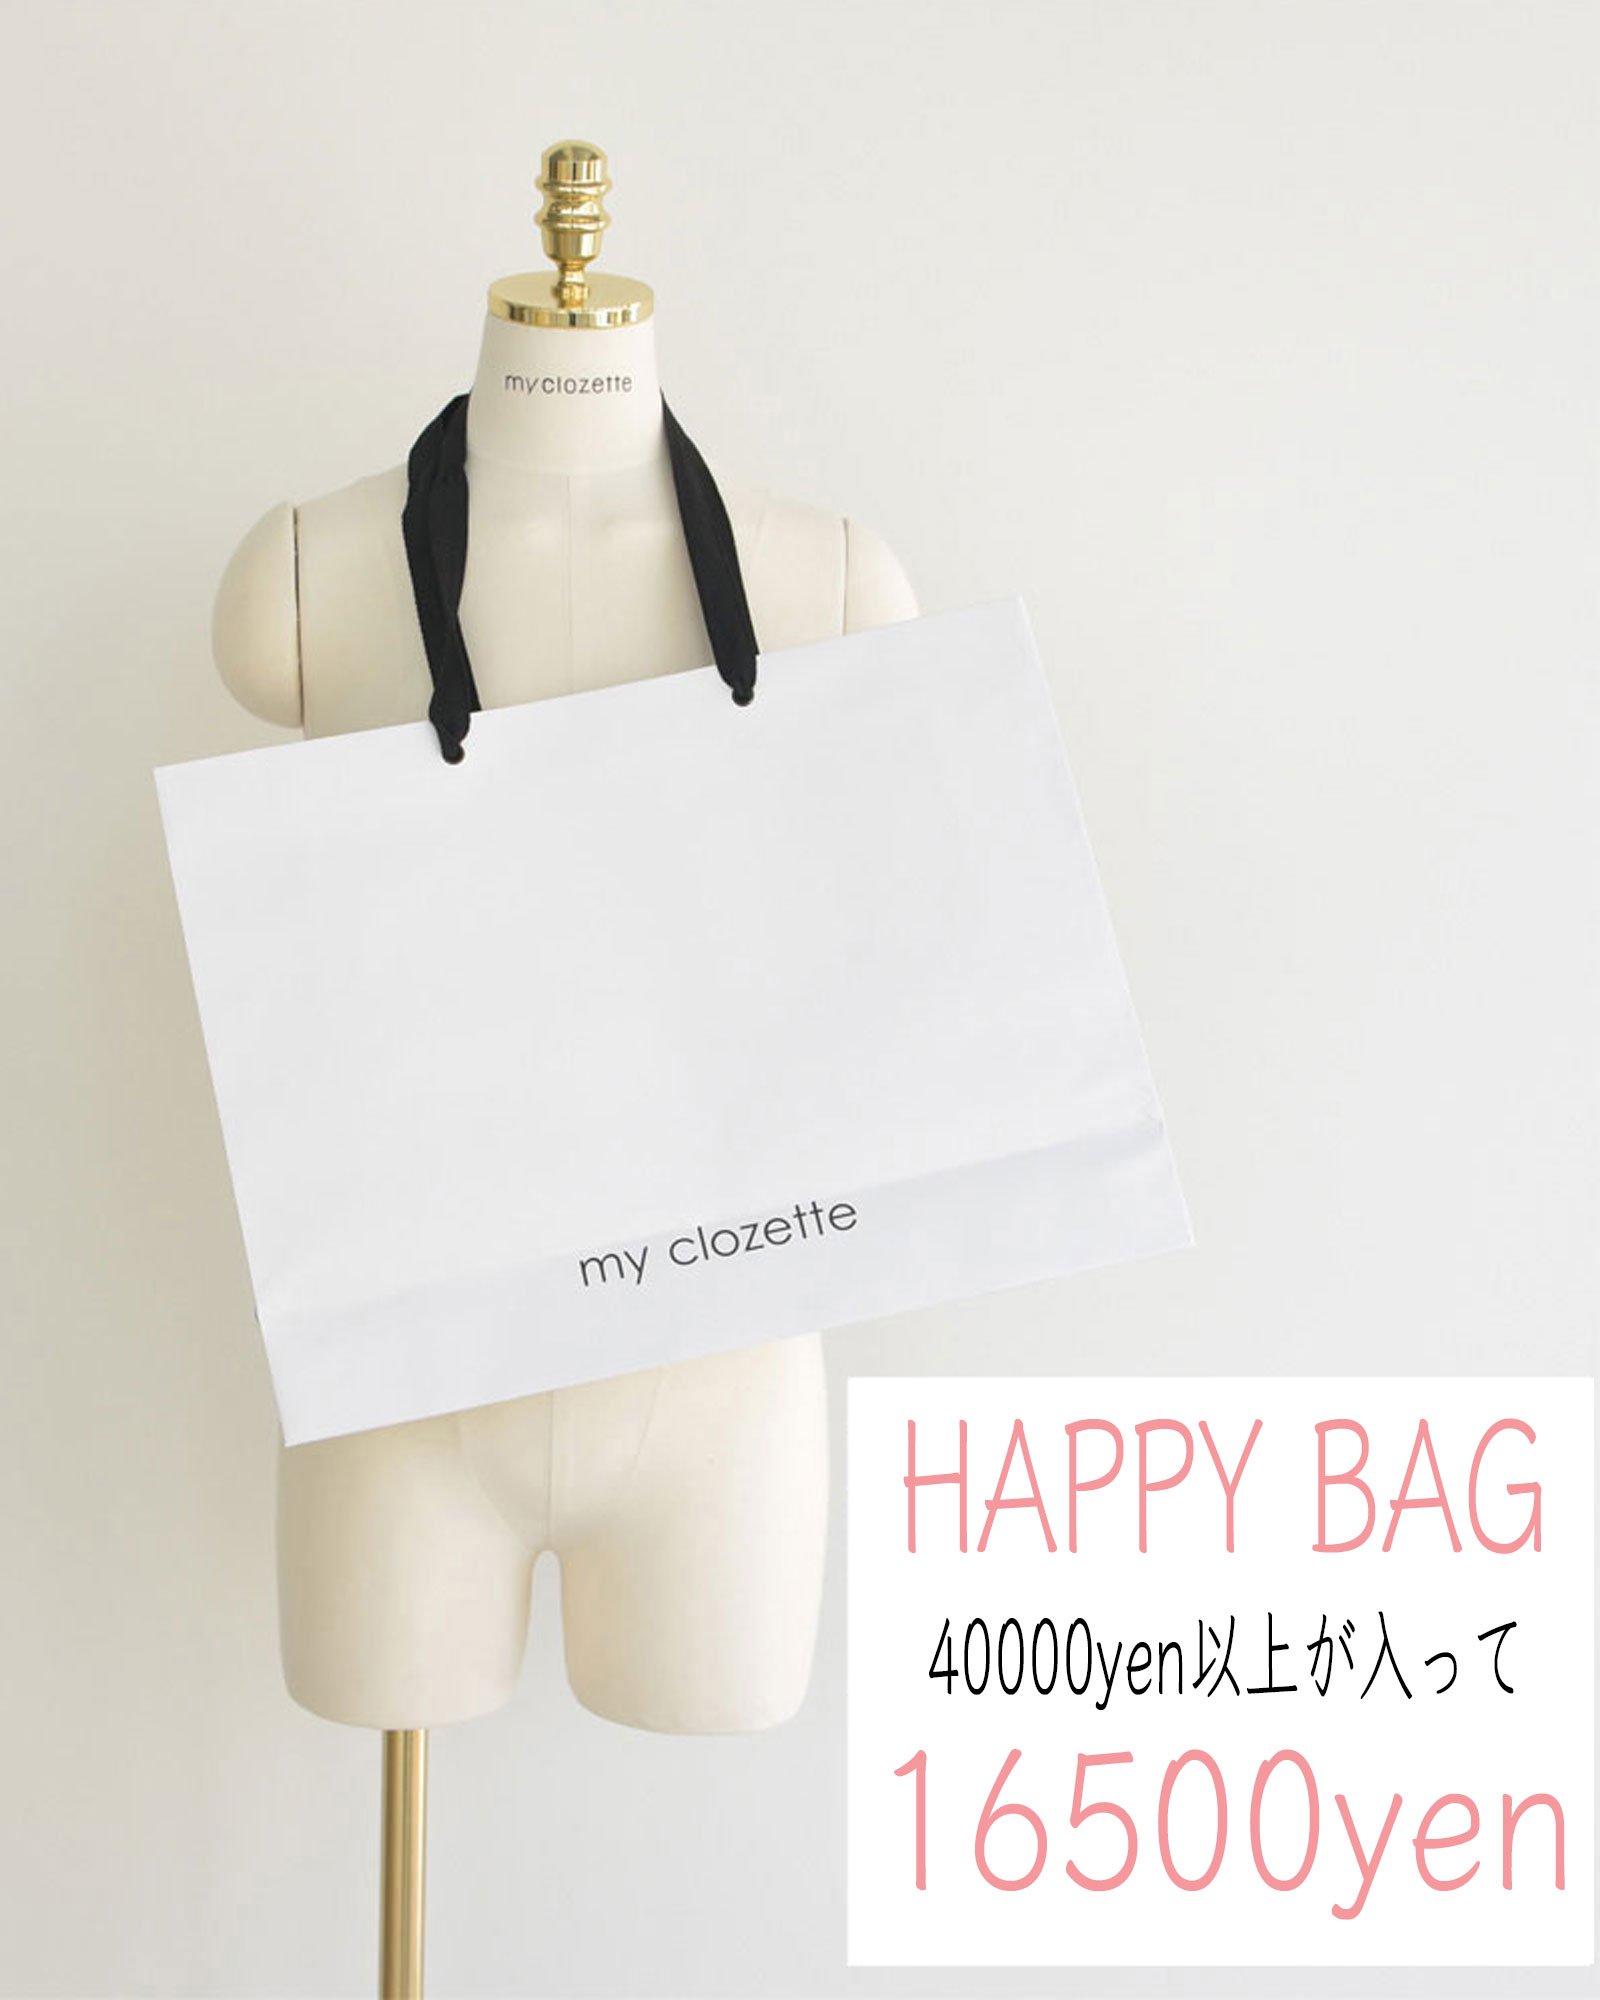 HAPPY BAG 16500yen 送料別